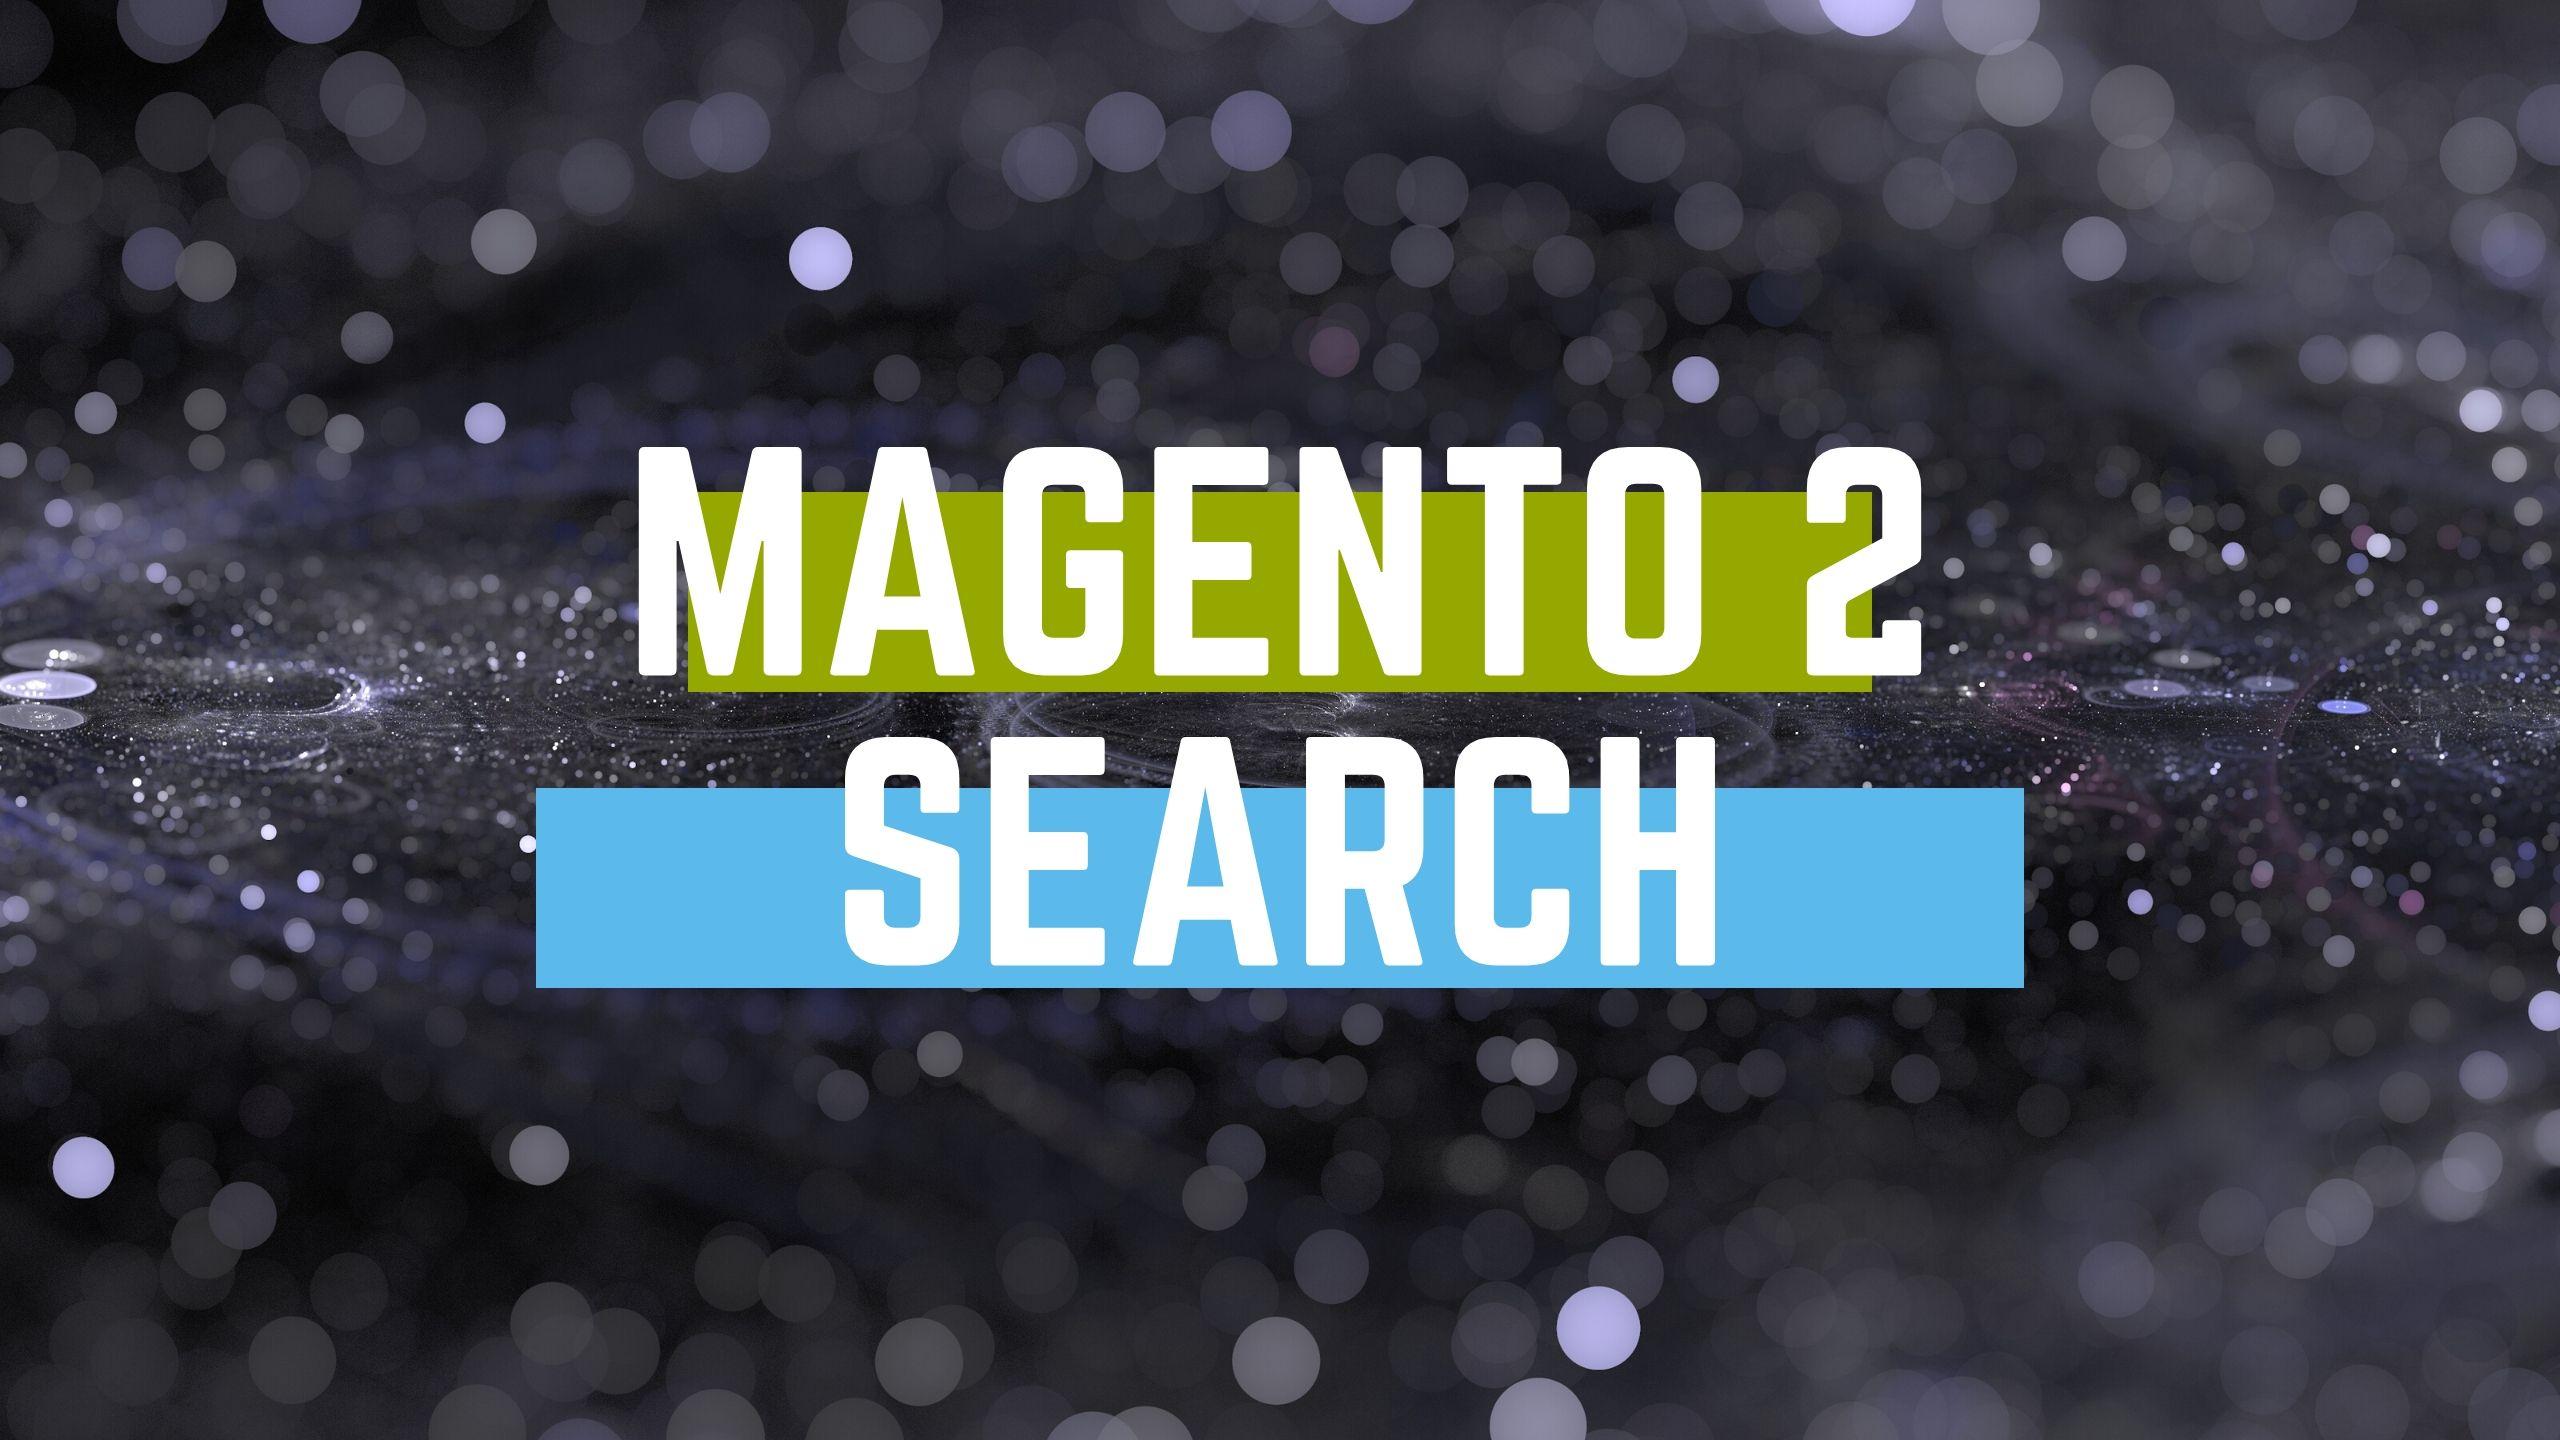 Magento 2 search